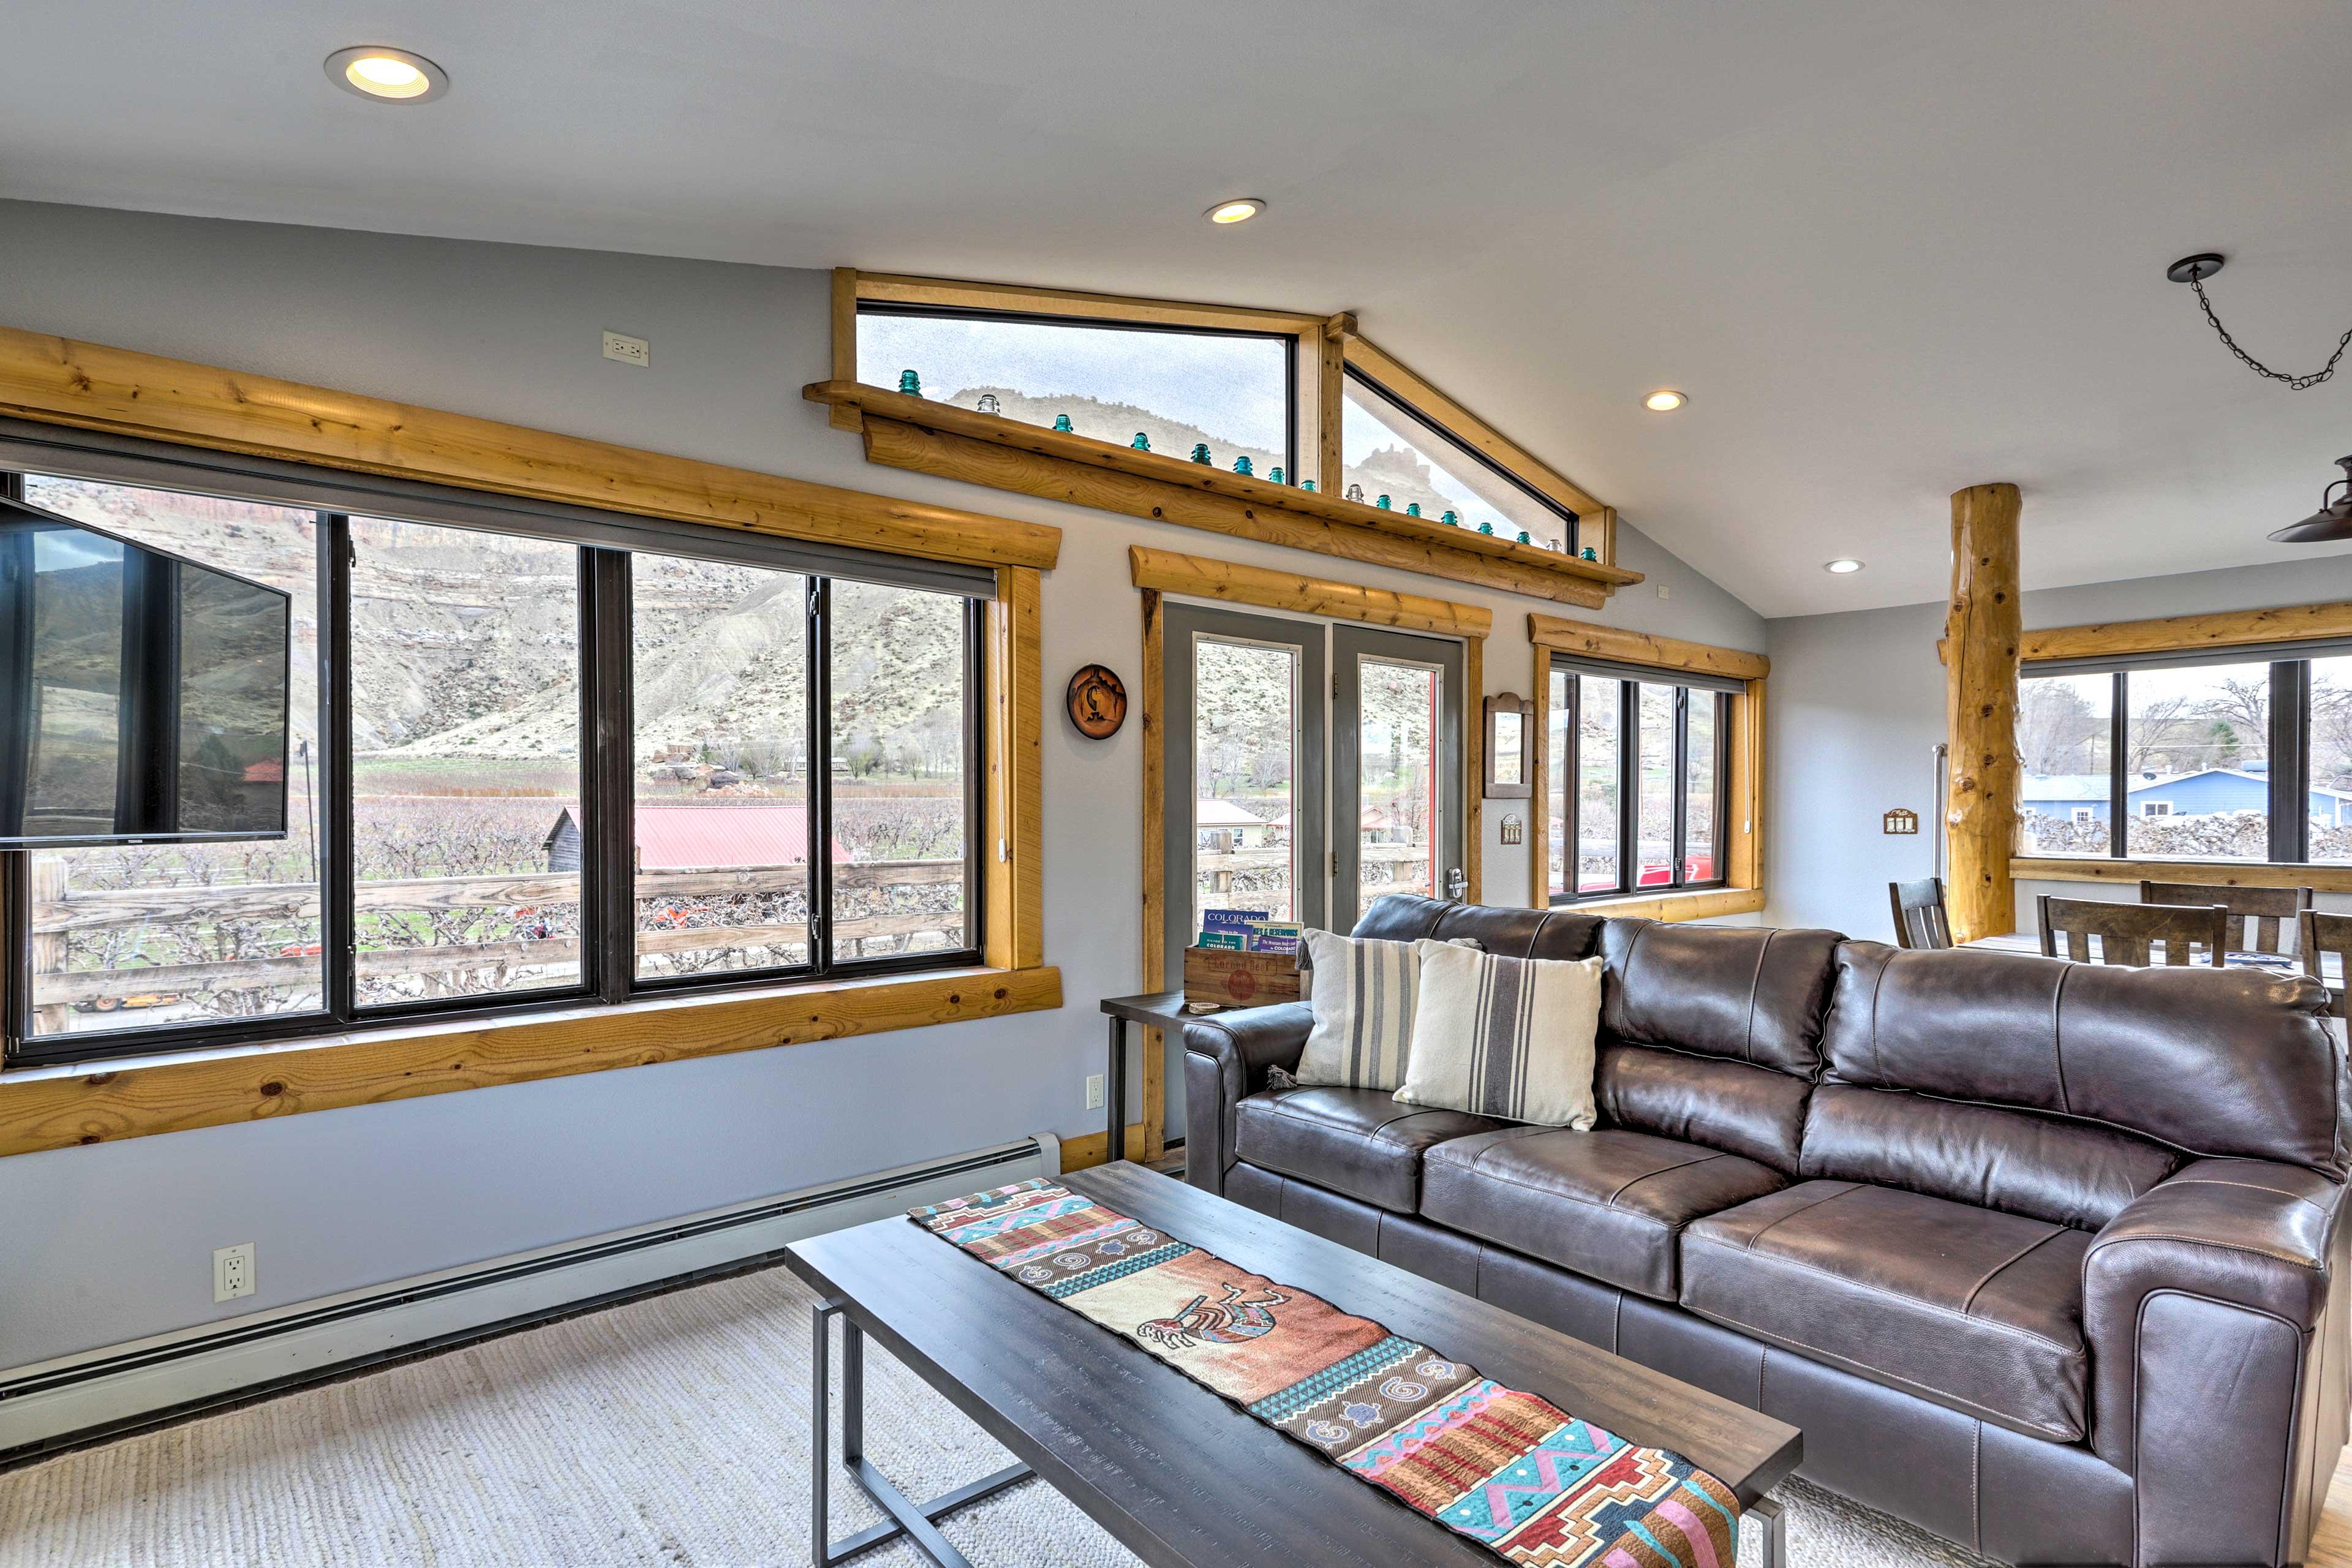 Natural light illuminates the interior of this cozy cottage.